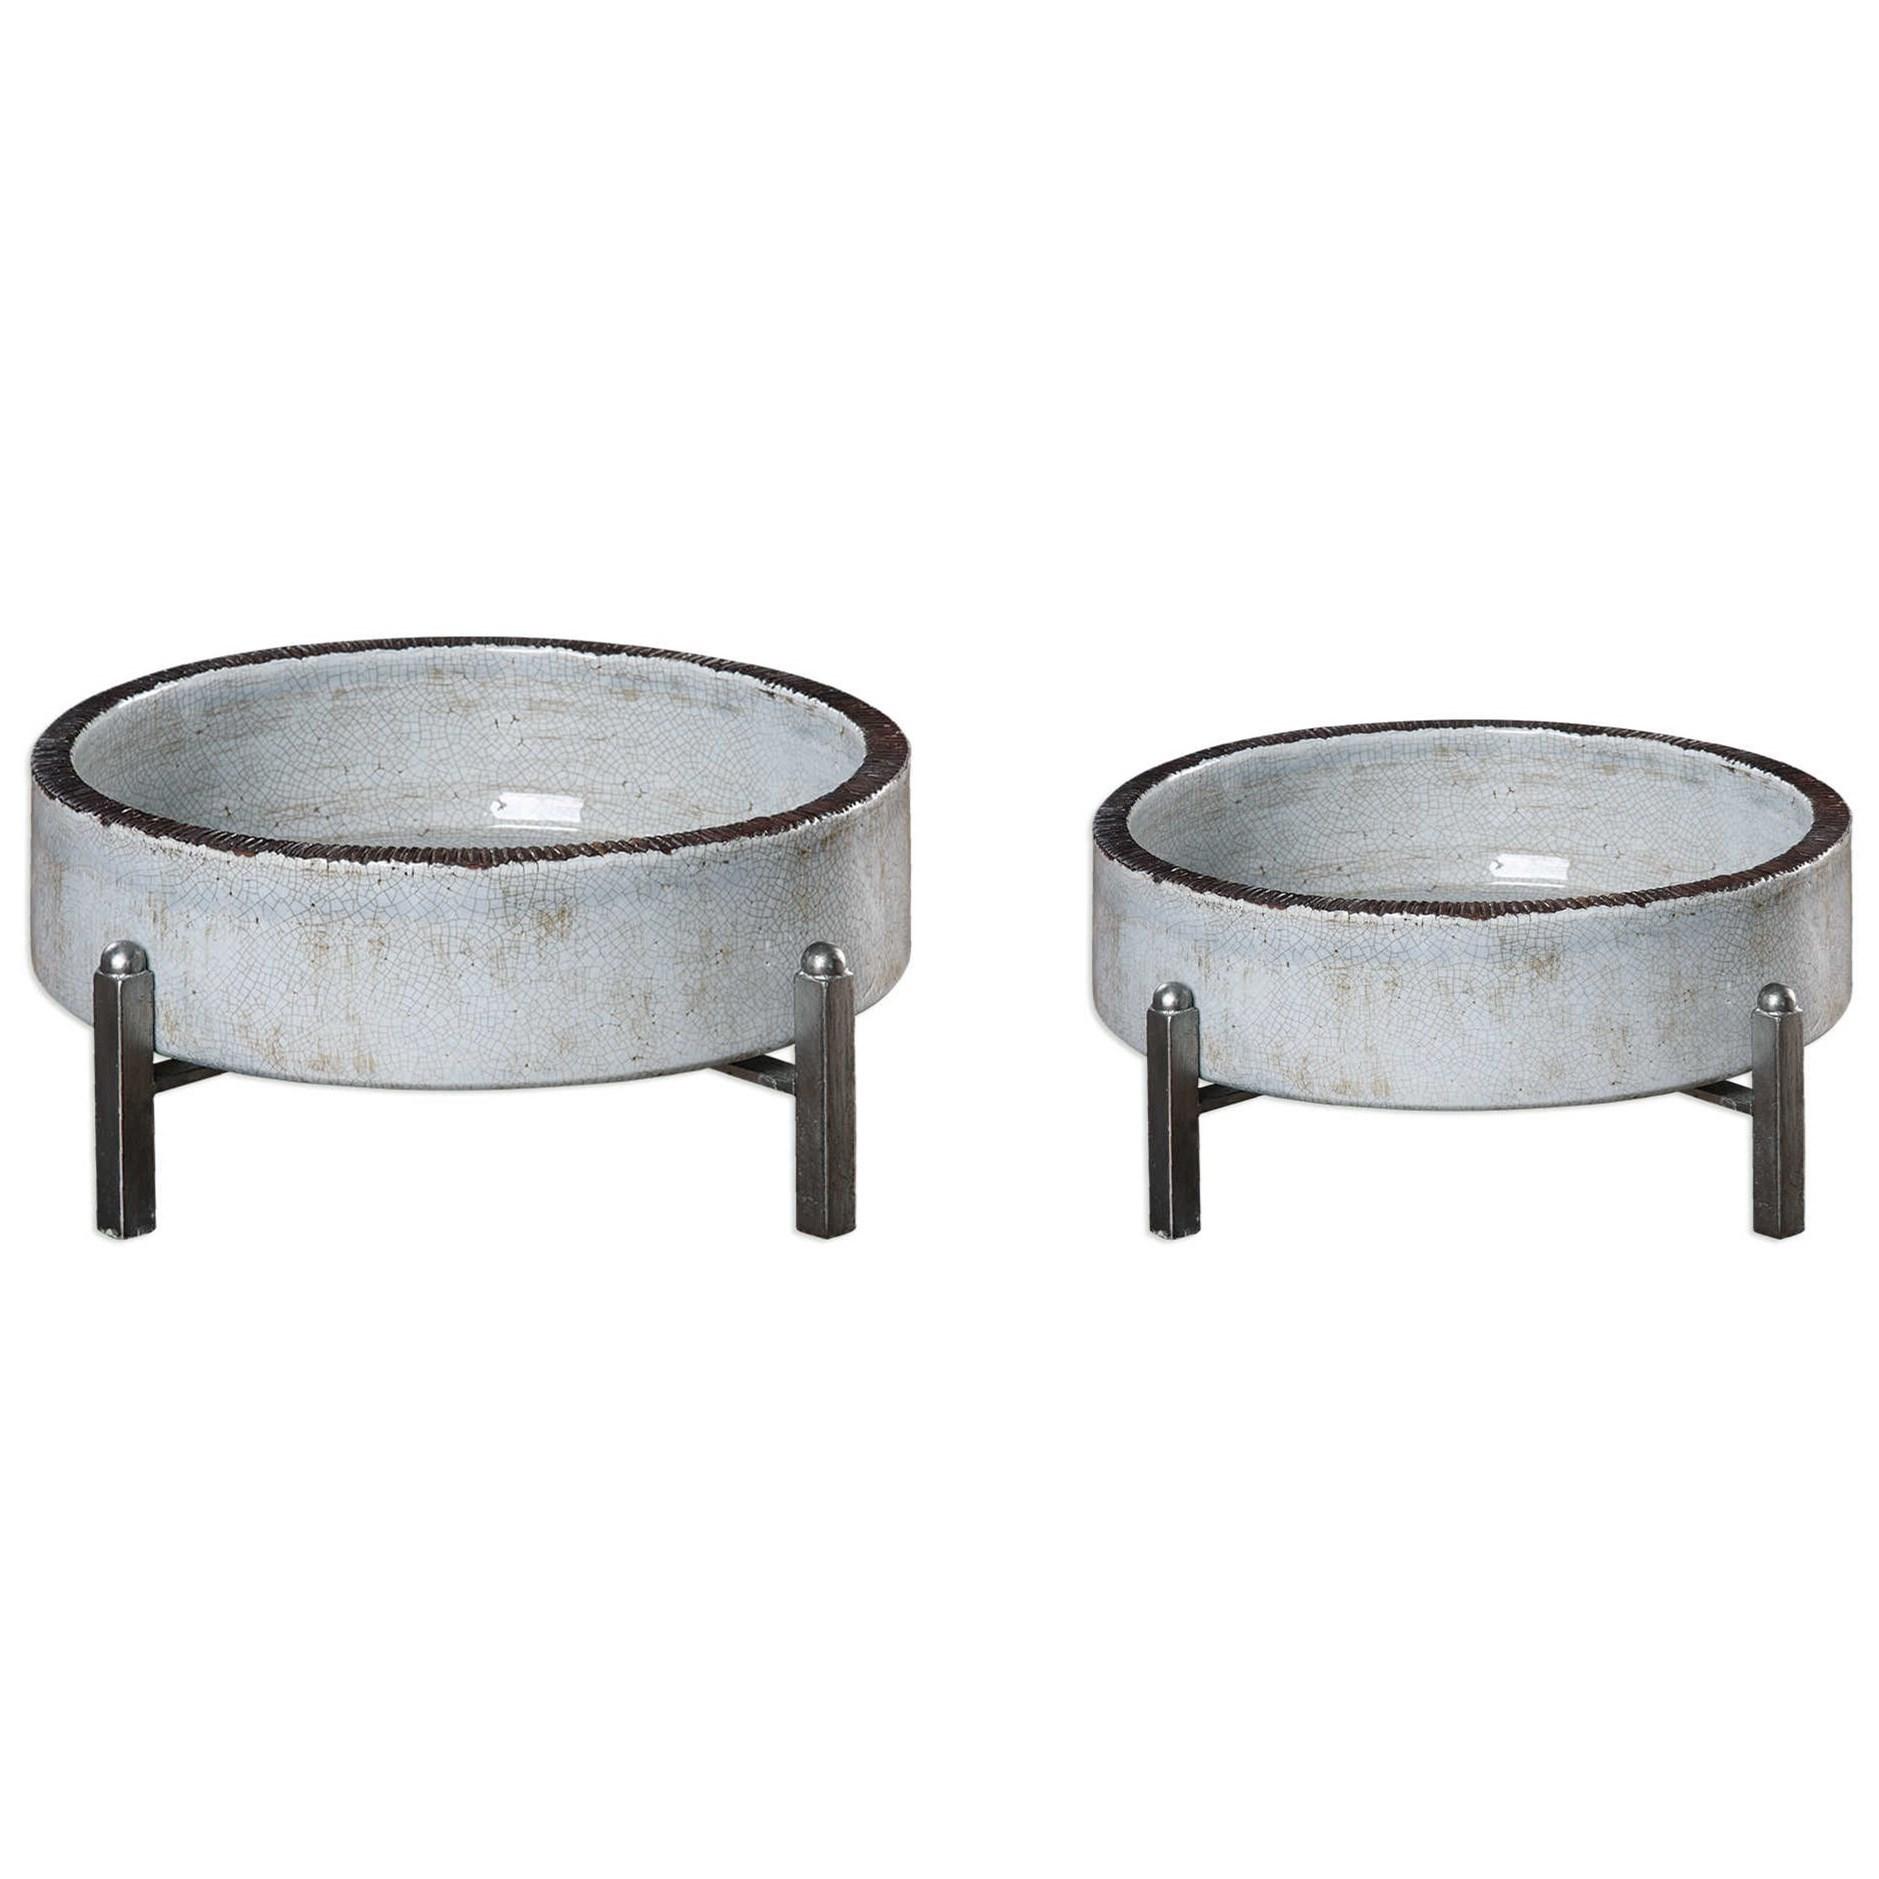 Accessories Essie Pale Gray Bowls (Set of 2) by Uttermost at Mueller Furniture